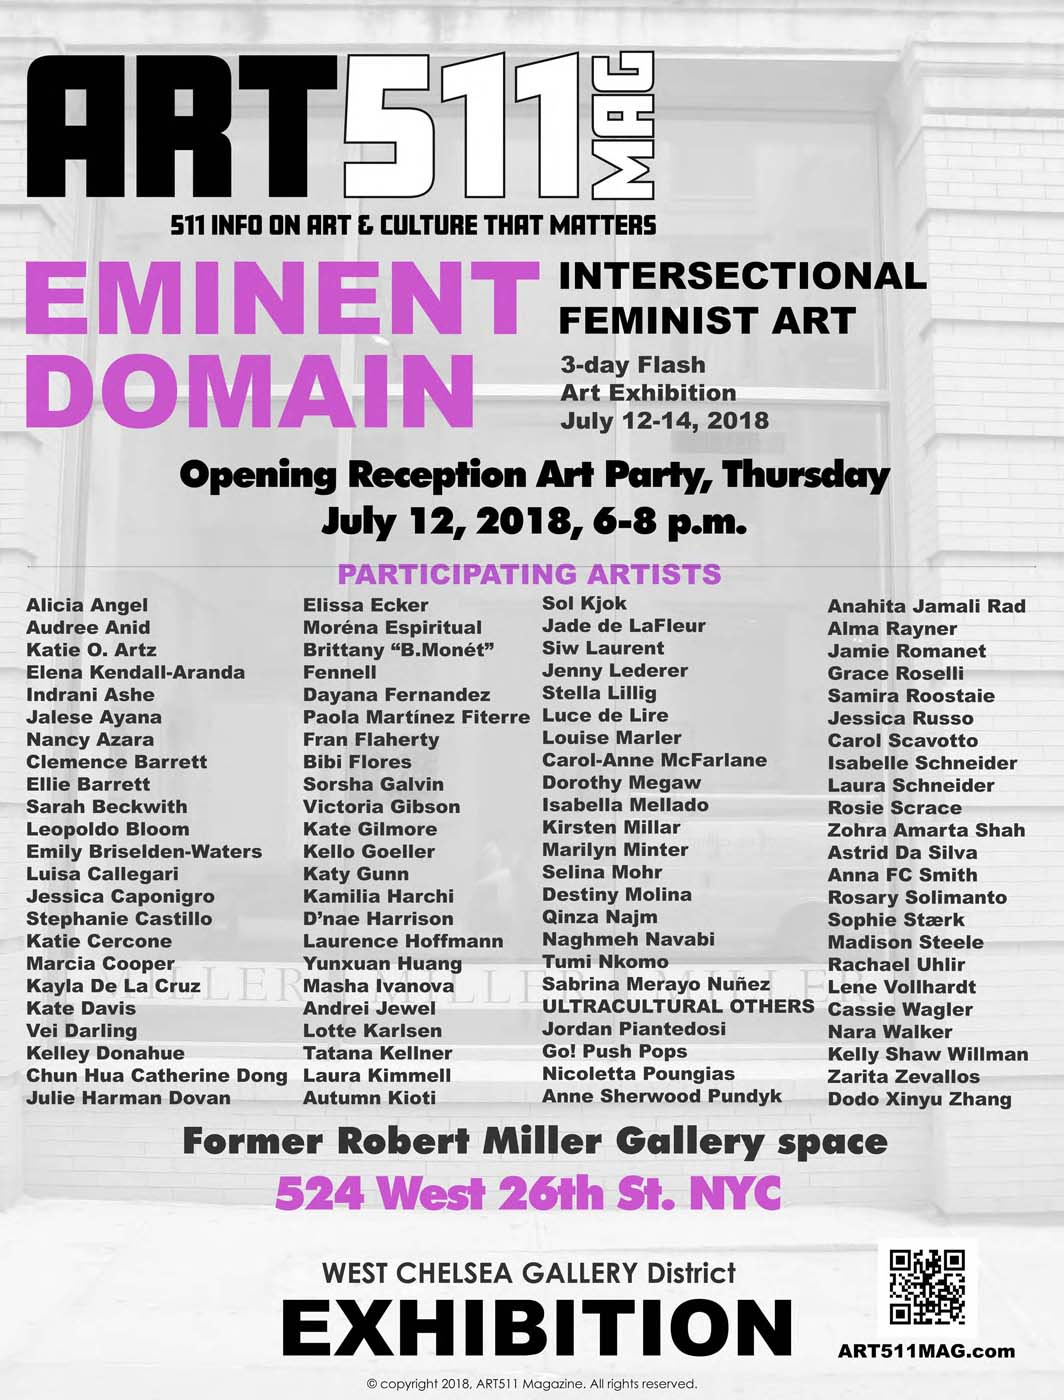 ED_19x25_poster_Exhibition_sm.jpg